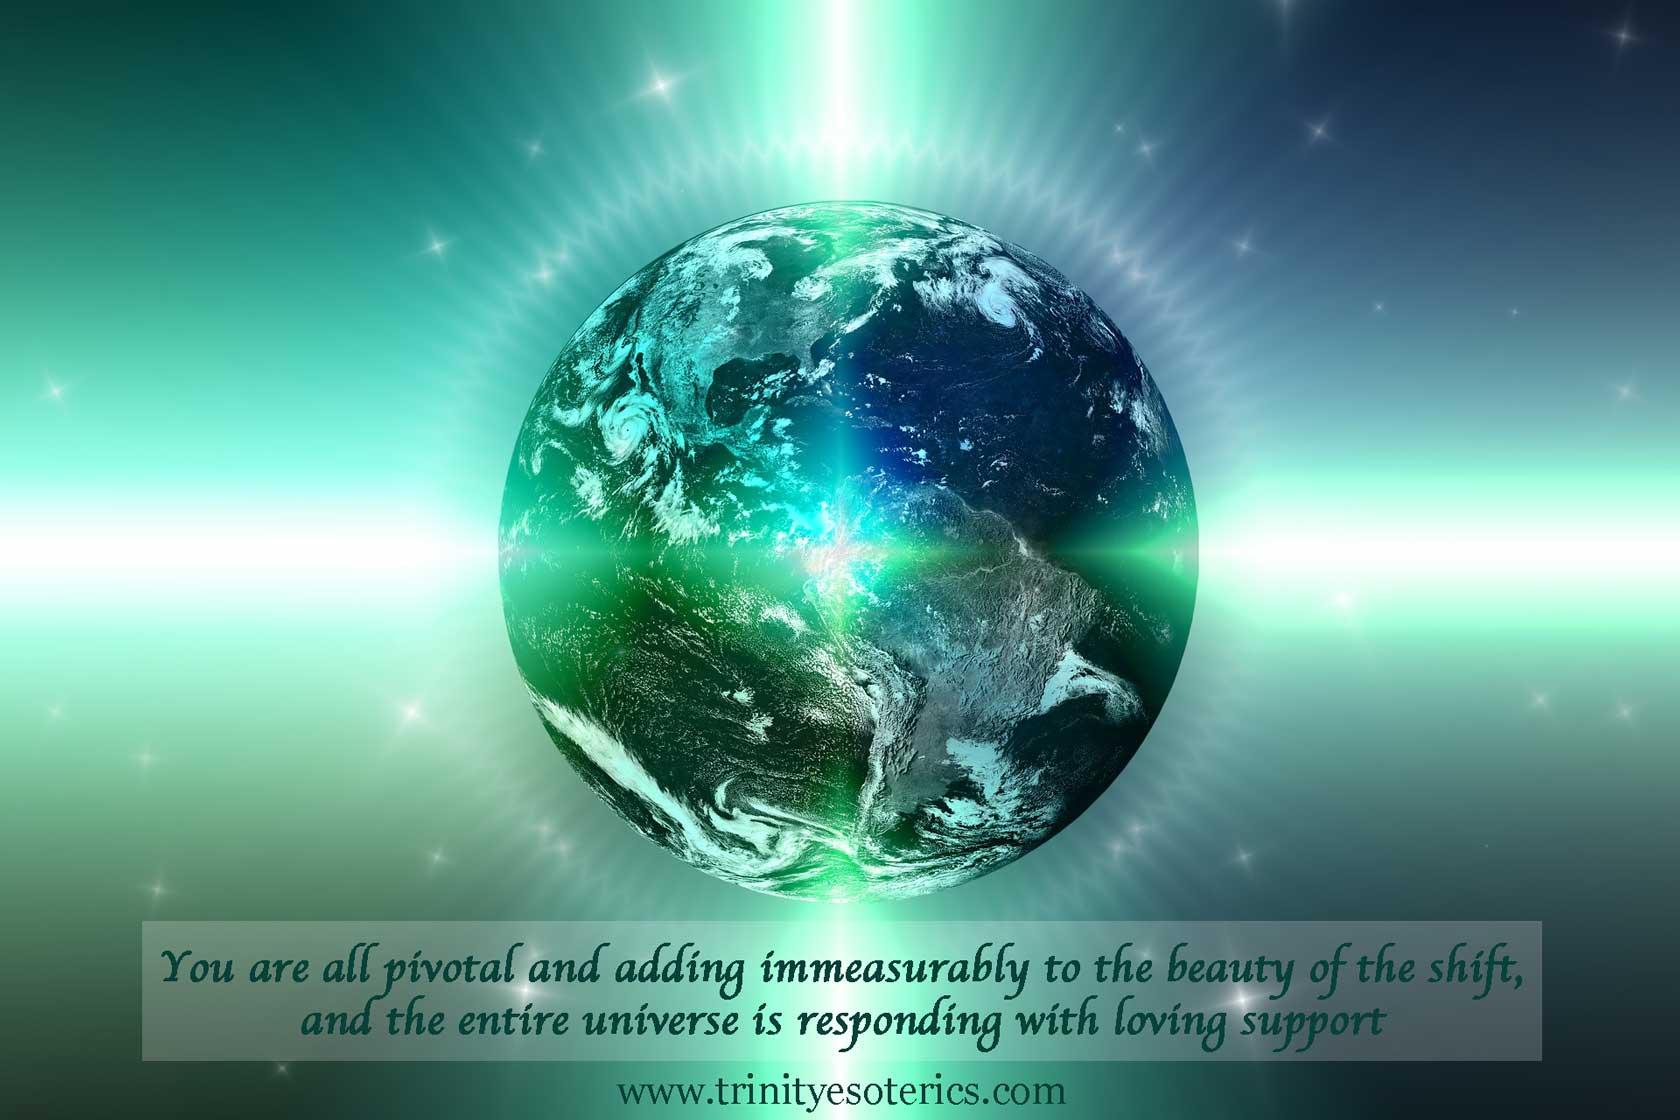 shining planet earth trinity esoterics